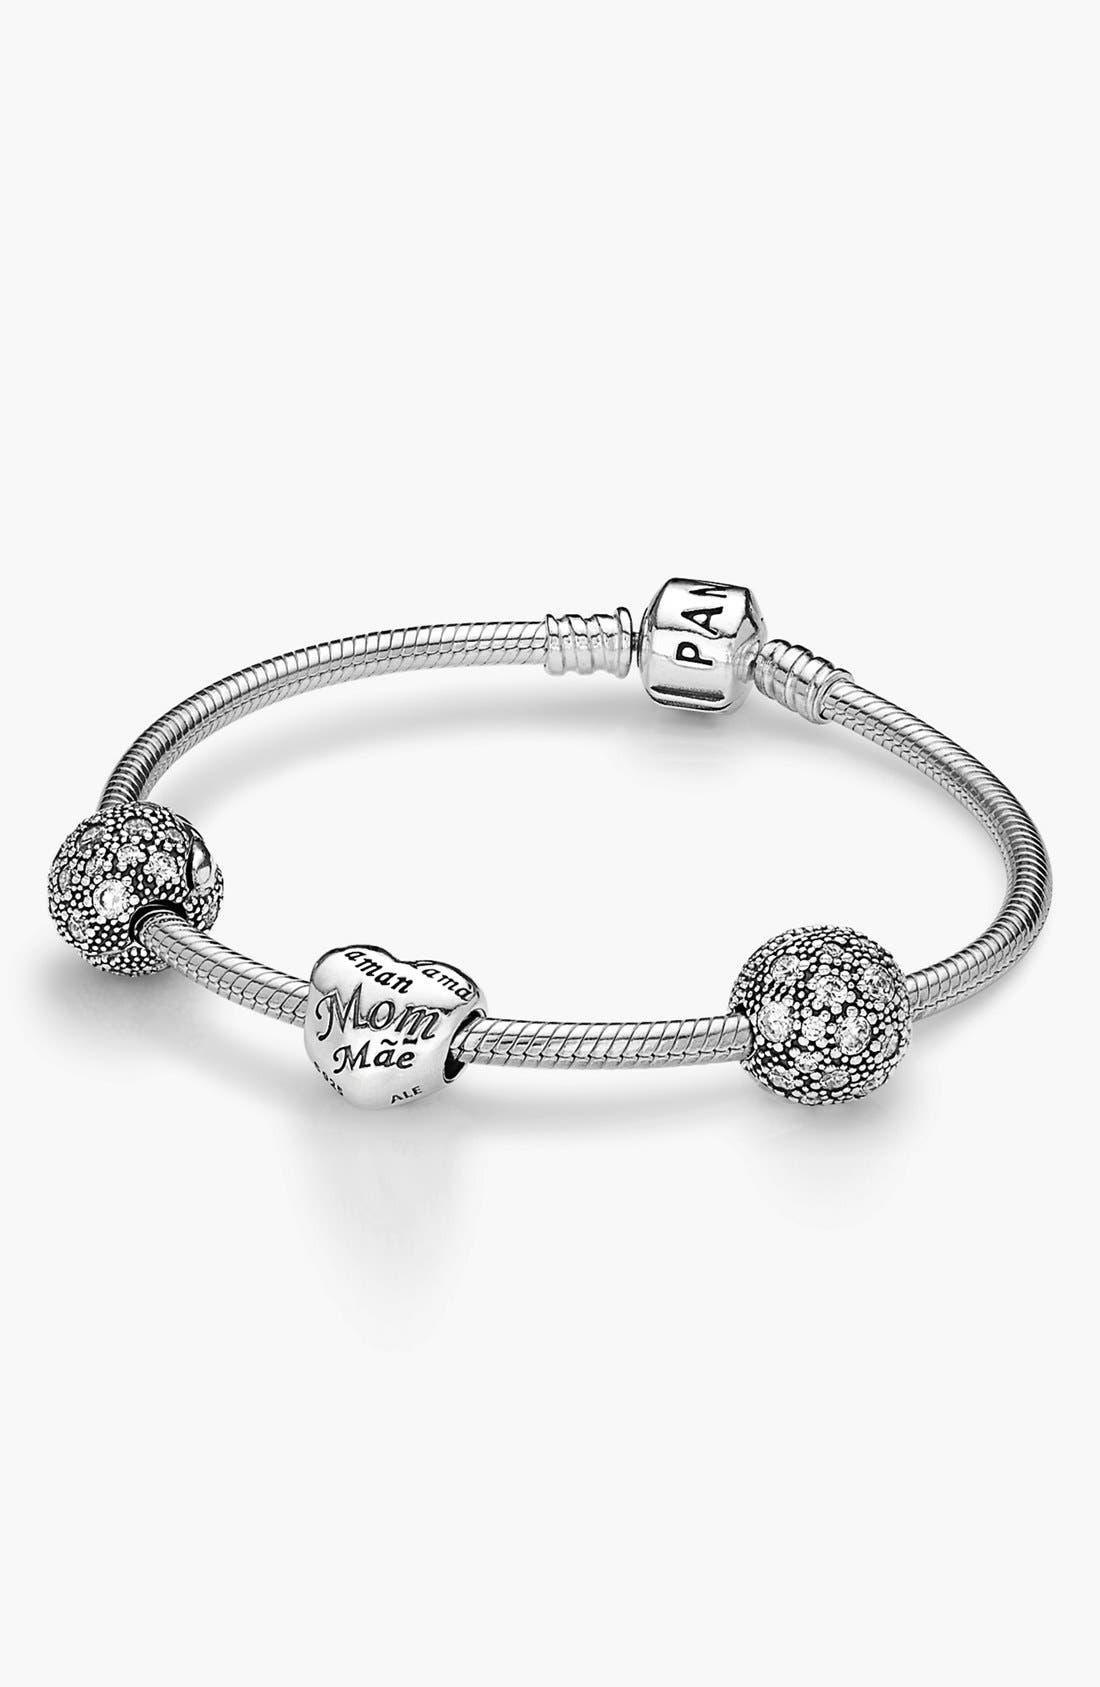 Alternate Image 1 Selected - PANDORA 'Forever in My Heart' Boxed Charm Bracelet Set ($250 Value)